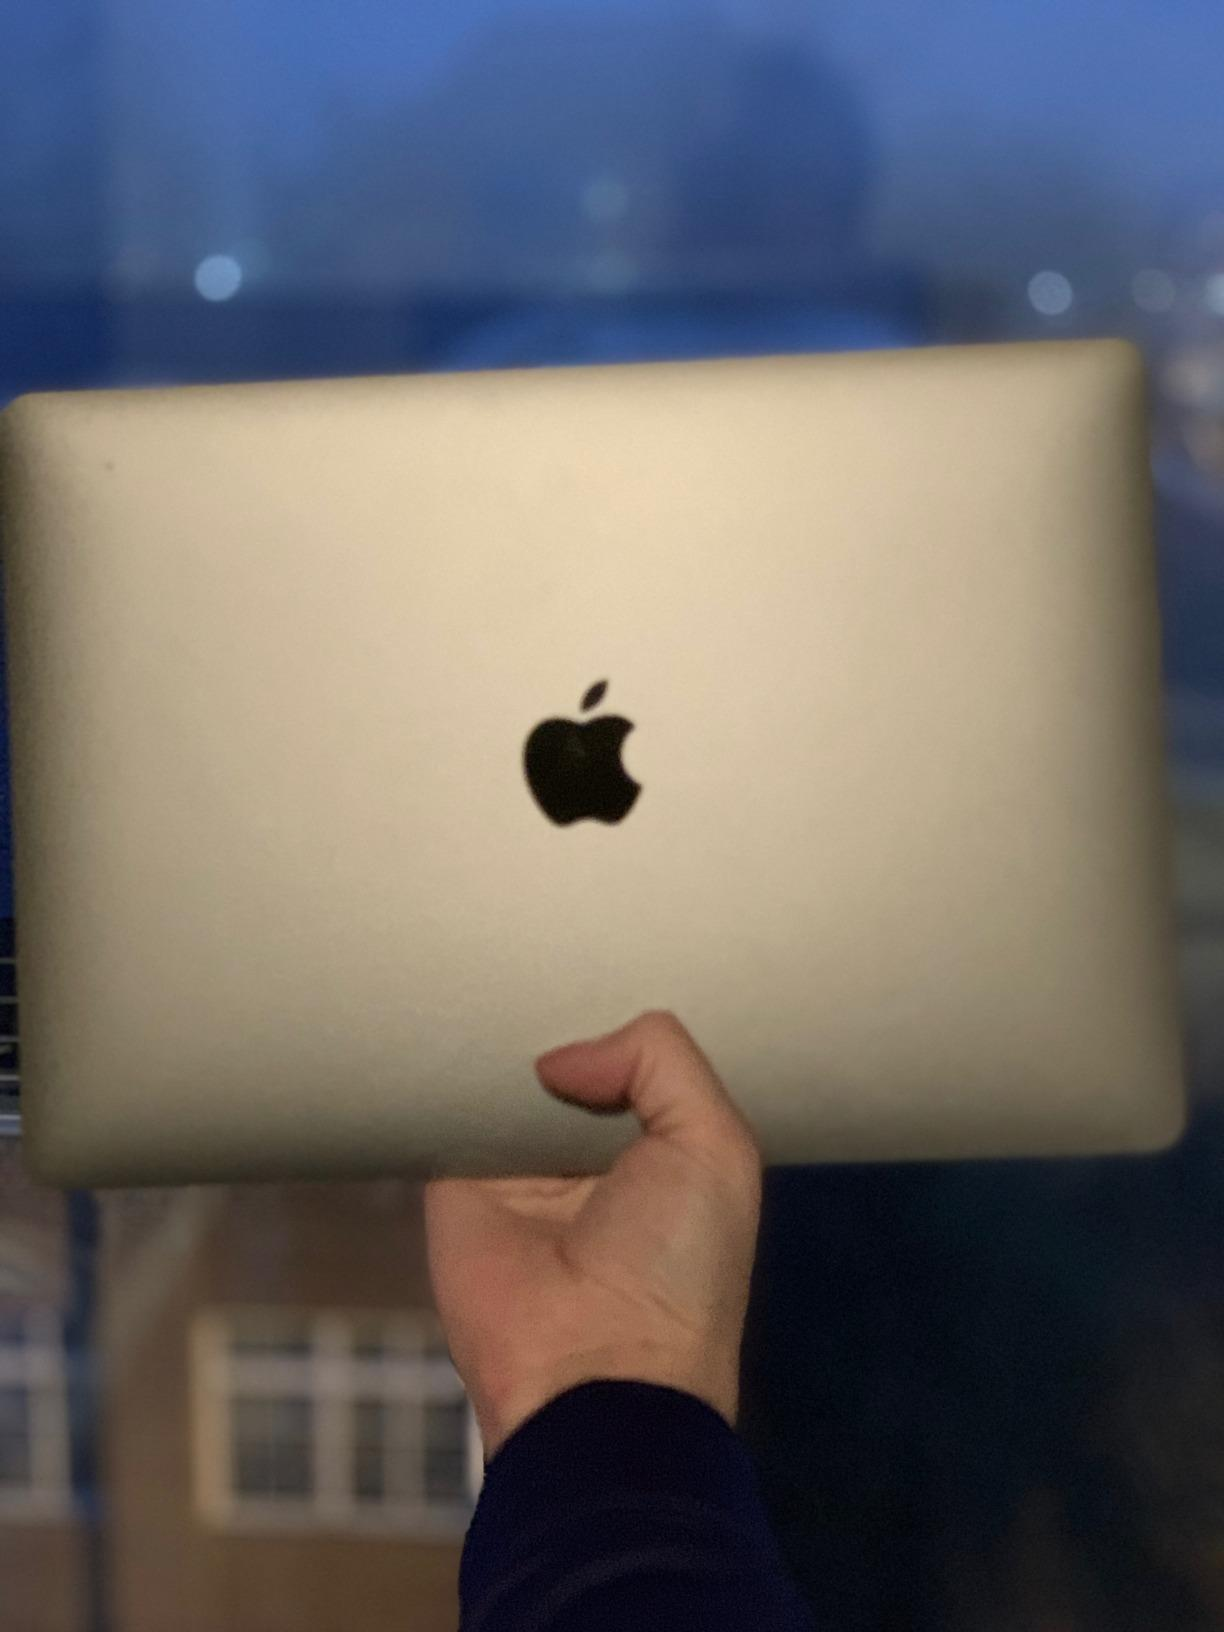 Apple MacBook Air (13-inch Retina display, 1 6GHz dual-core Intel Core i5,  128GB) - Gold (Latest Model)